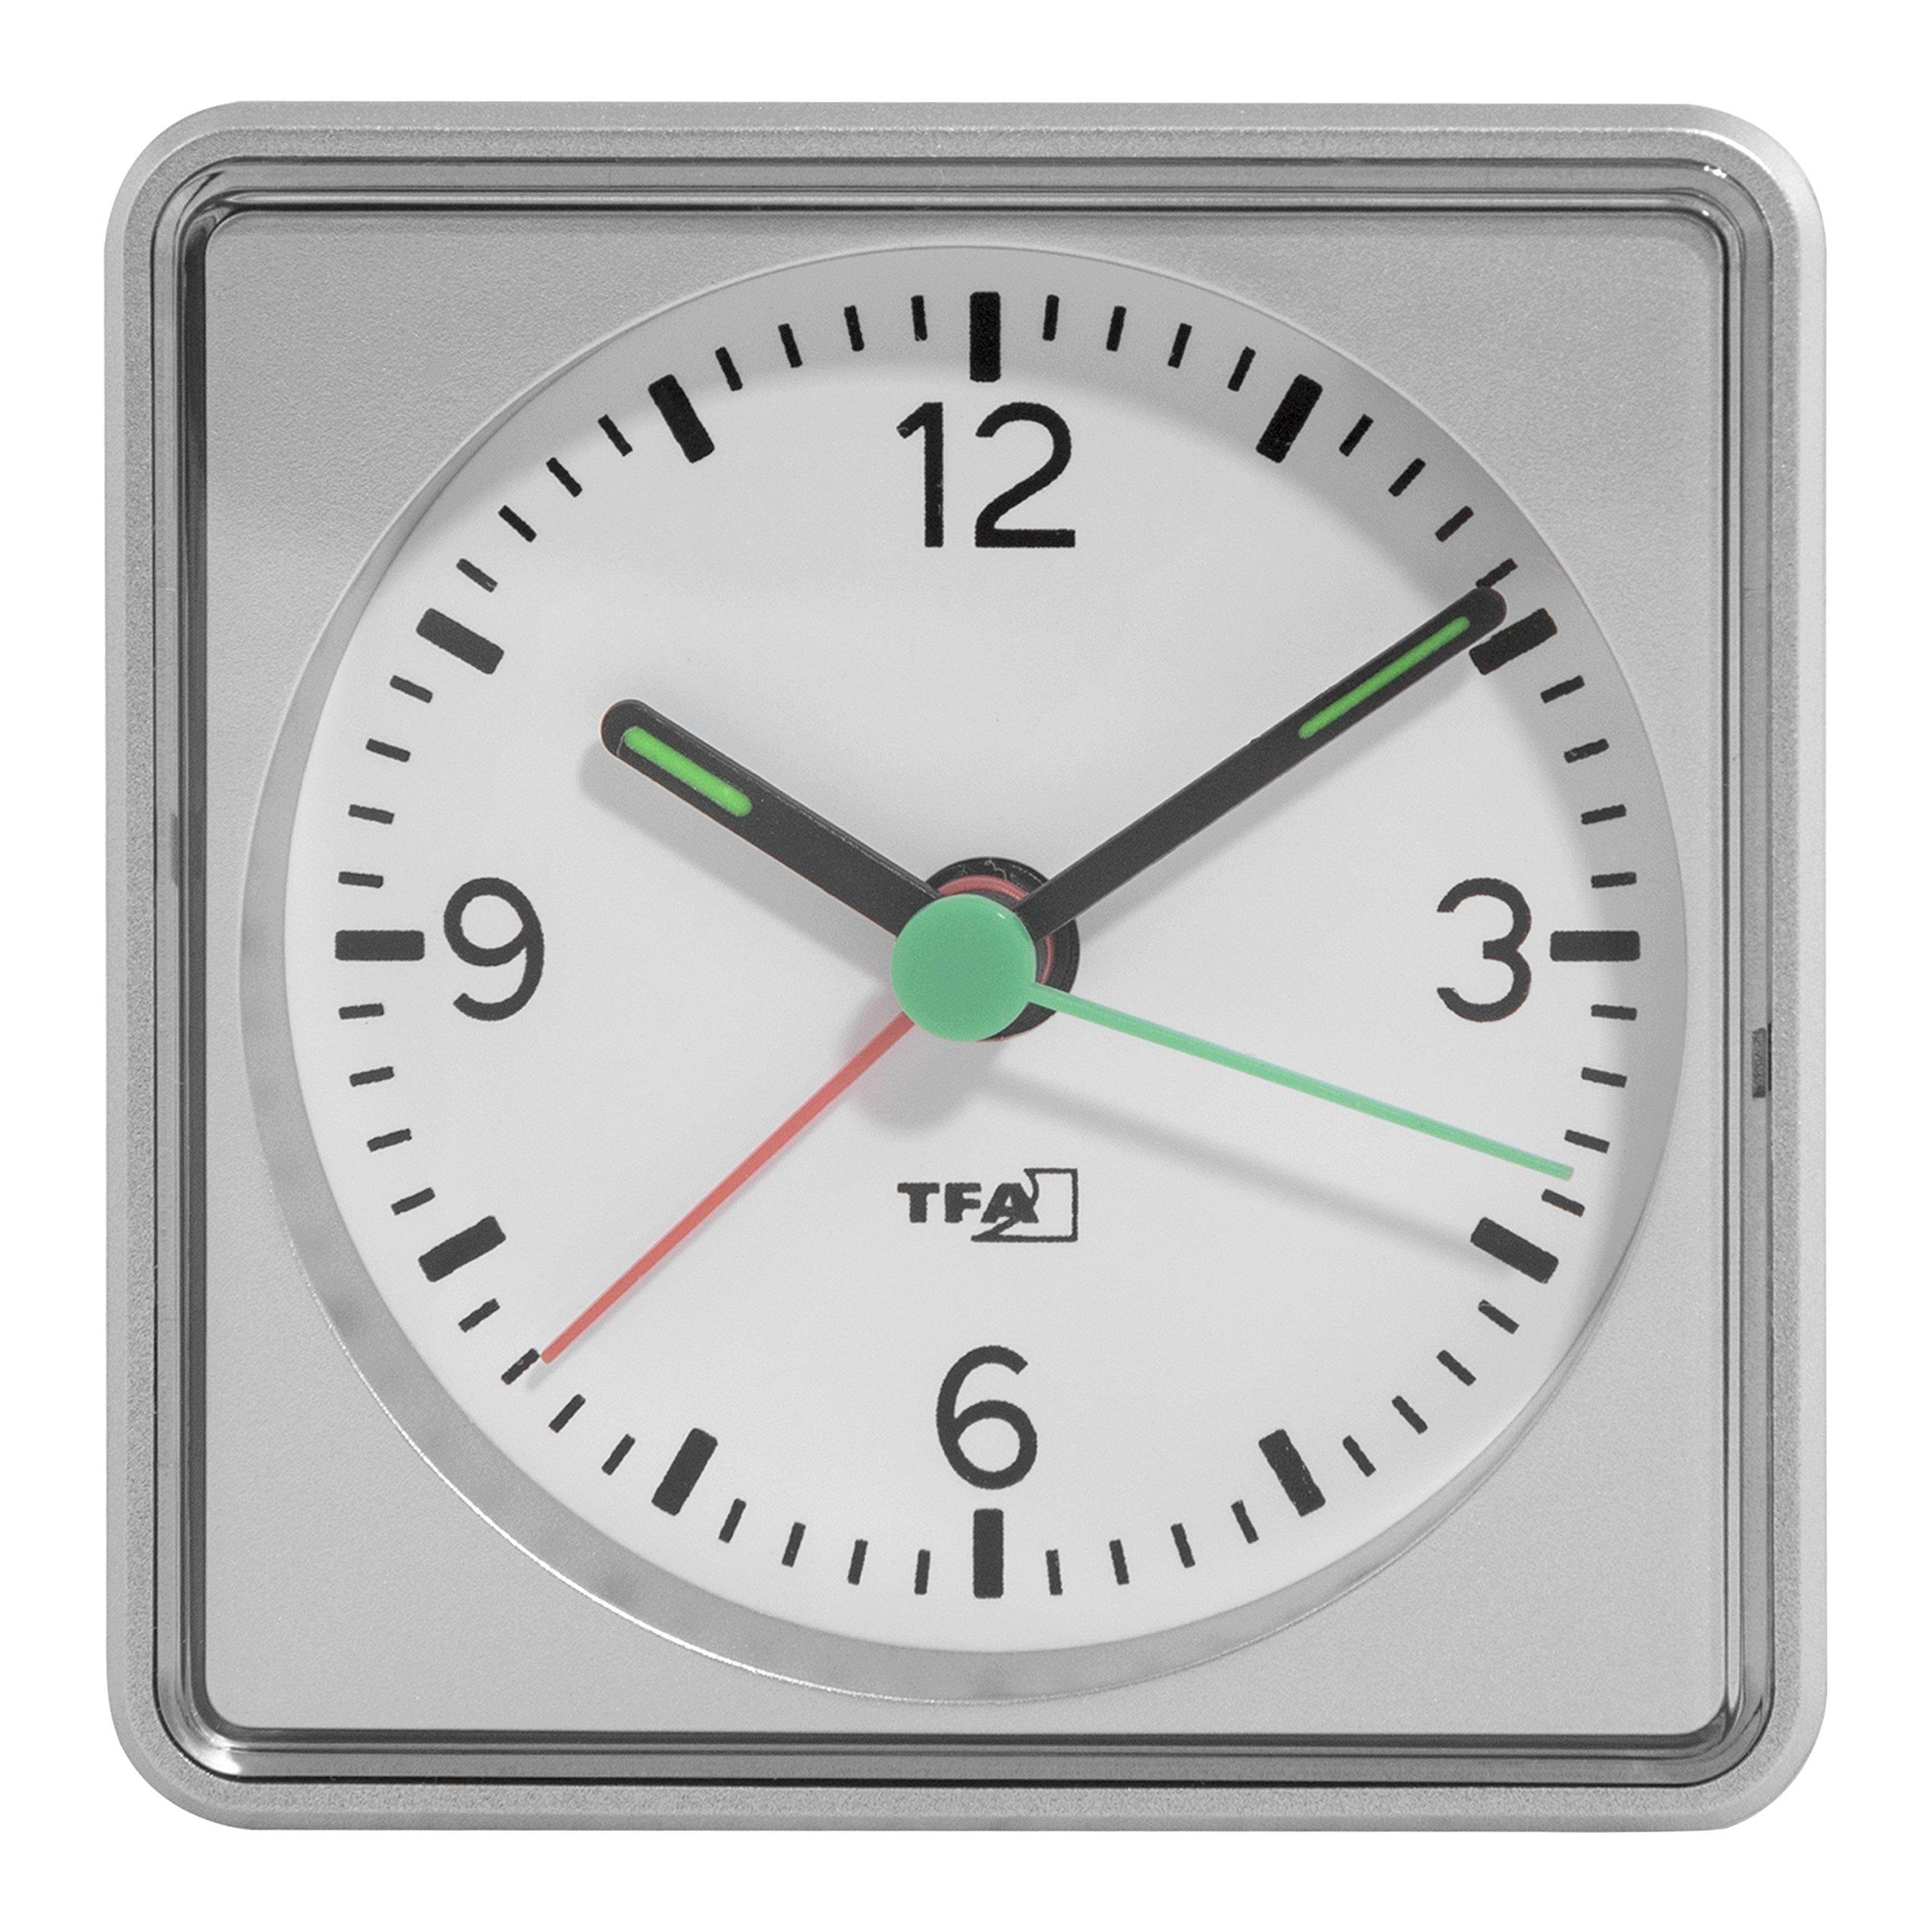 La Crosse Technology 60.1013.54 Push Electronic Alarm Clock, Silver